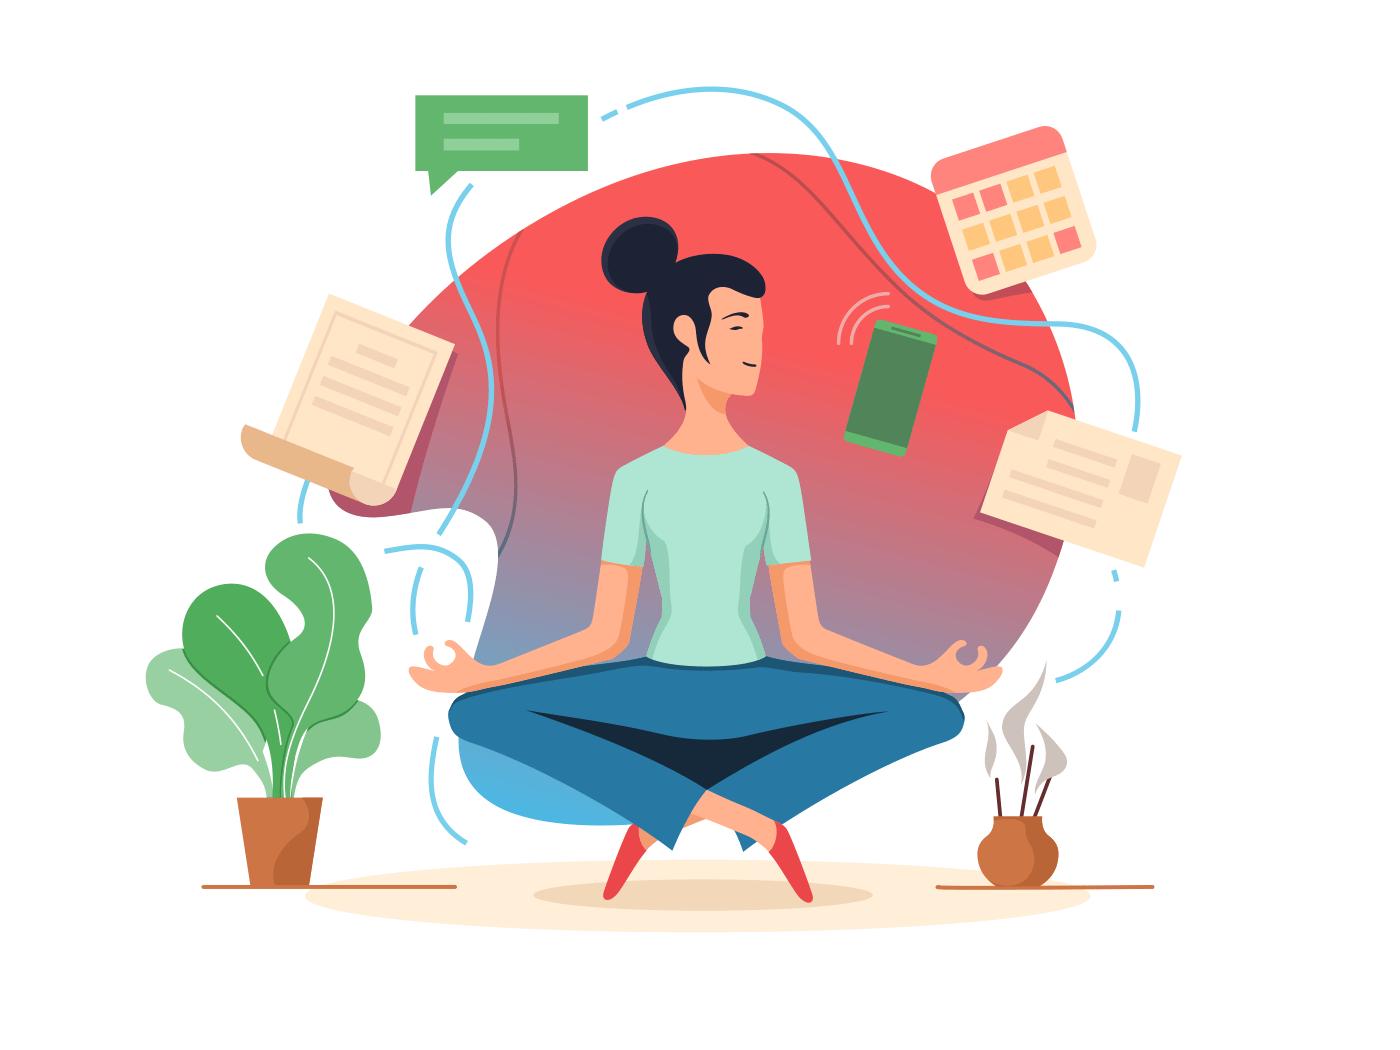 Woman balancing in lotus position